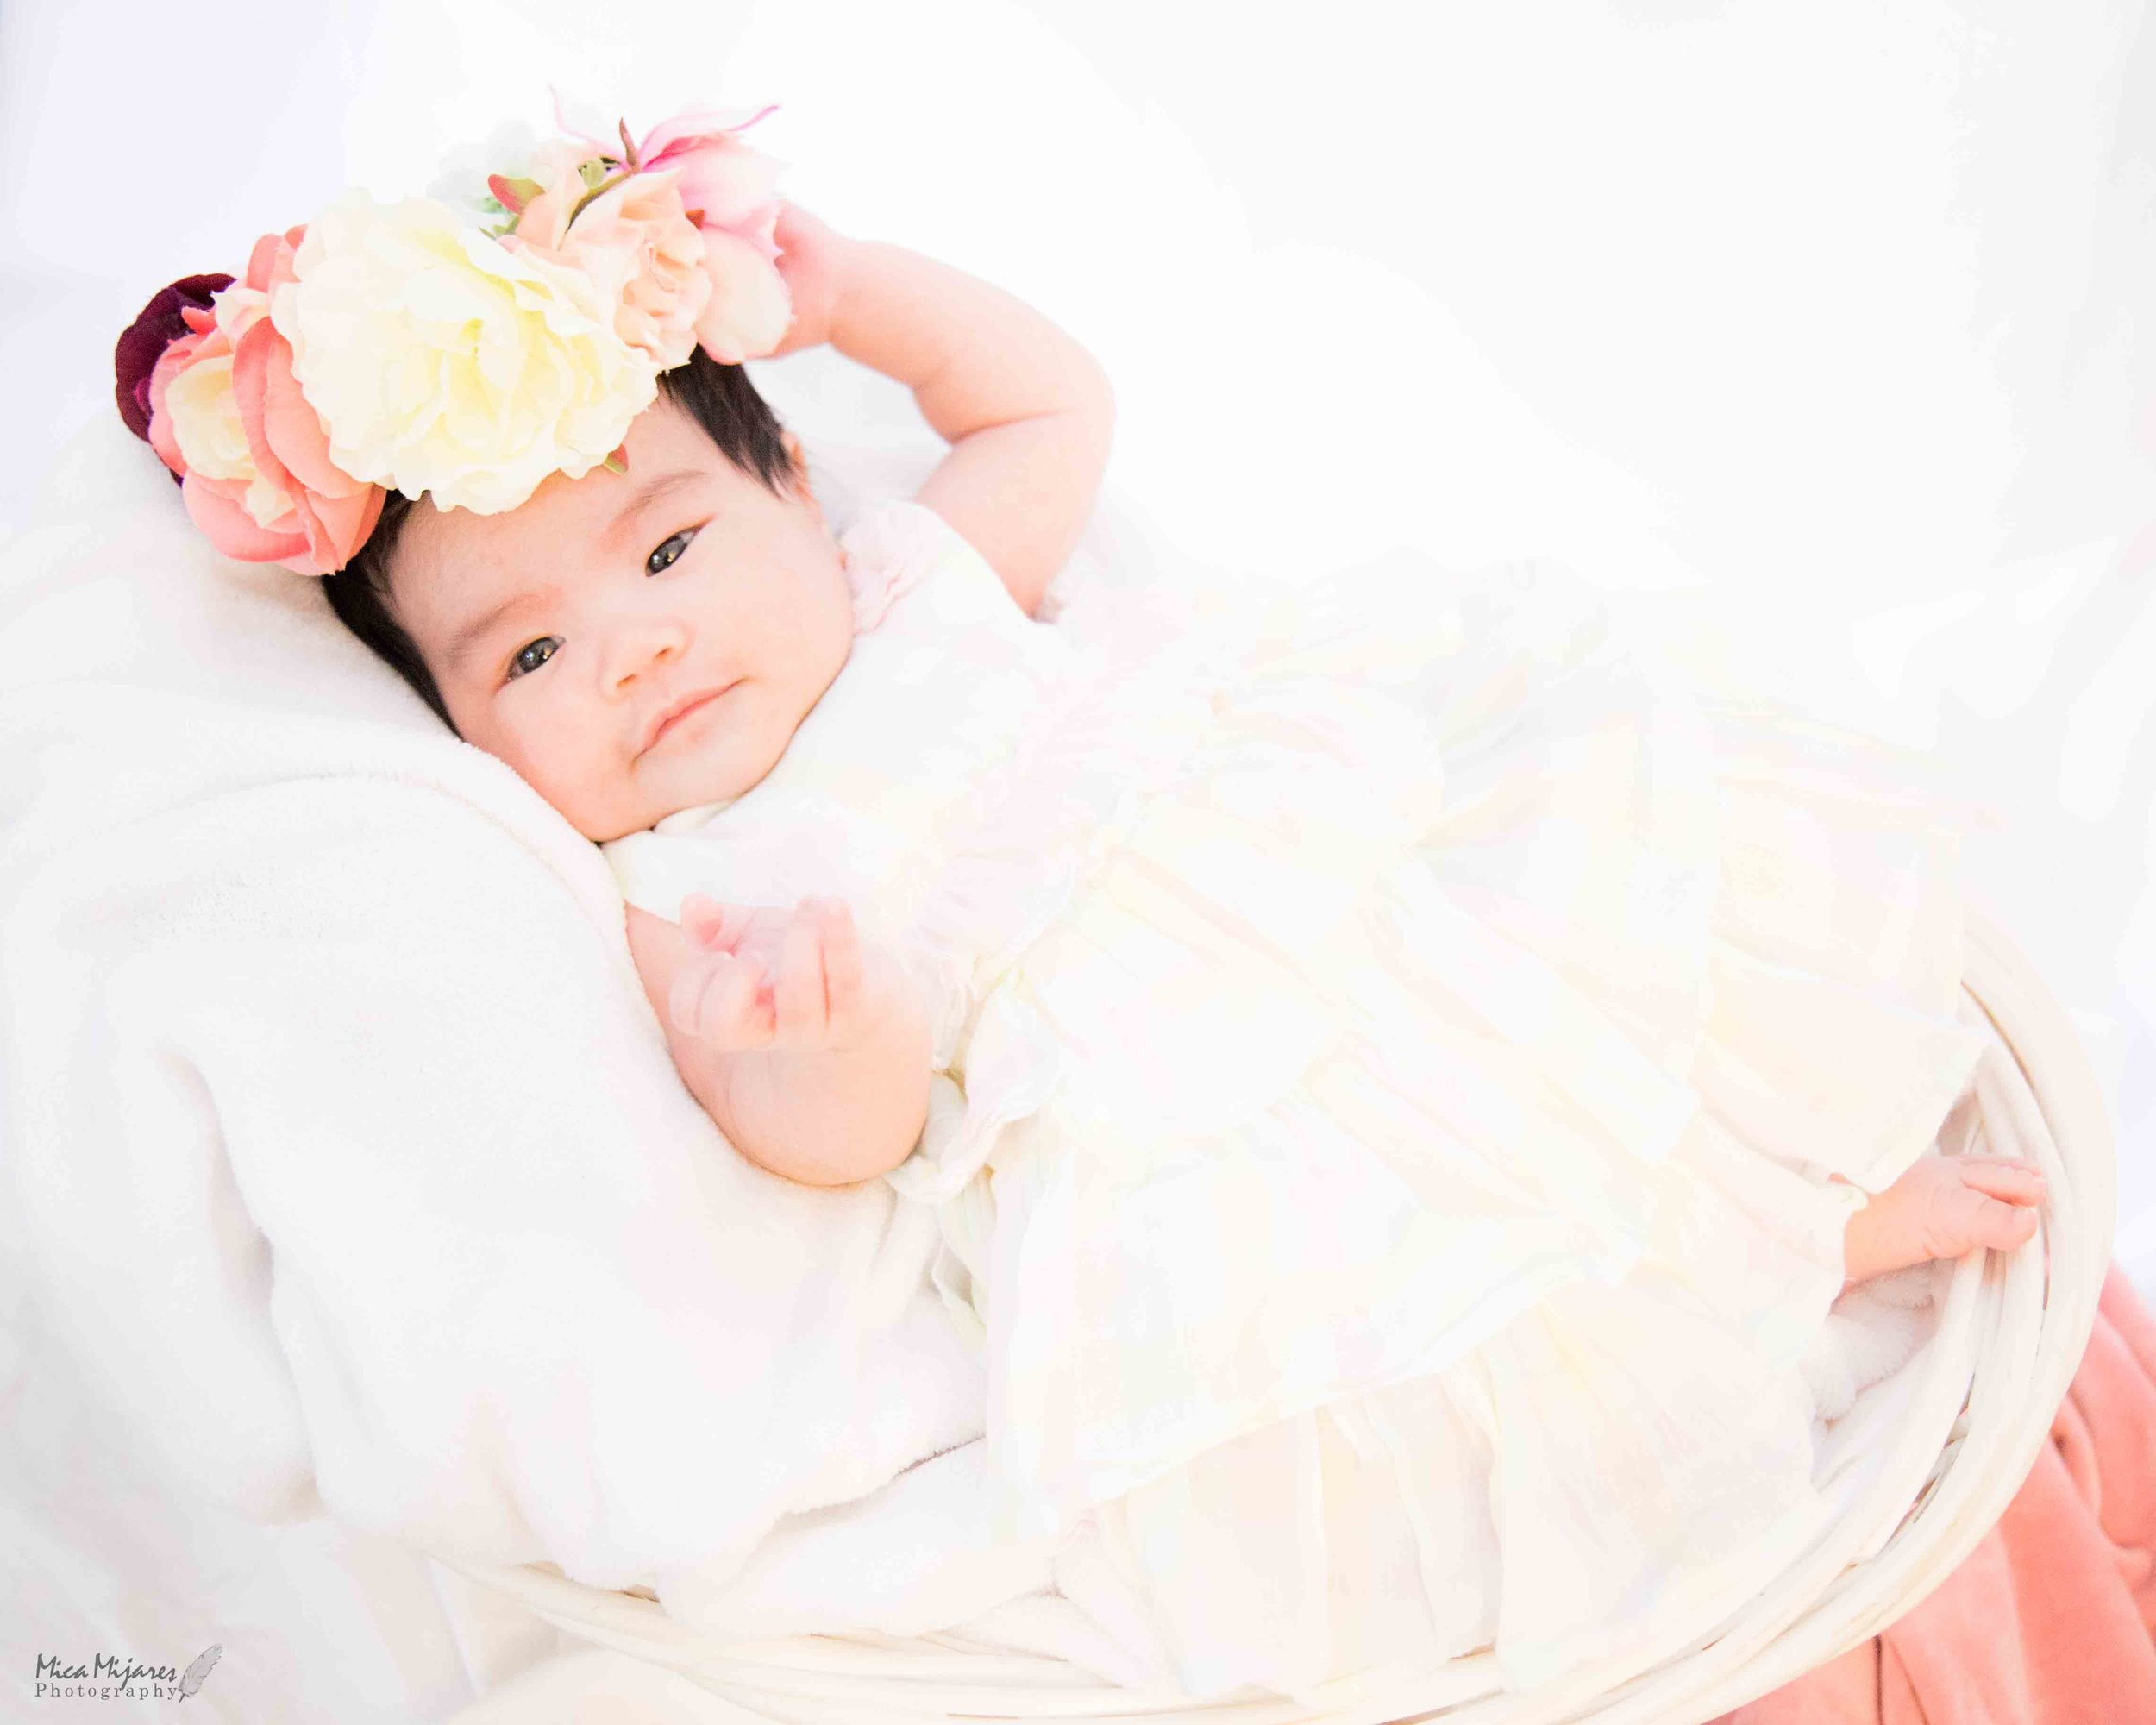 rileyfaith-BabyPhotography-MicaMijaresPhotography (20 of 27).jpg